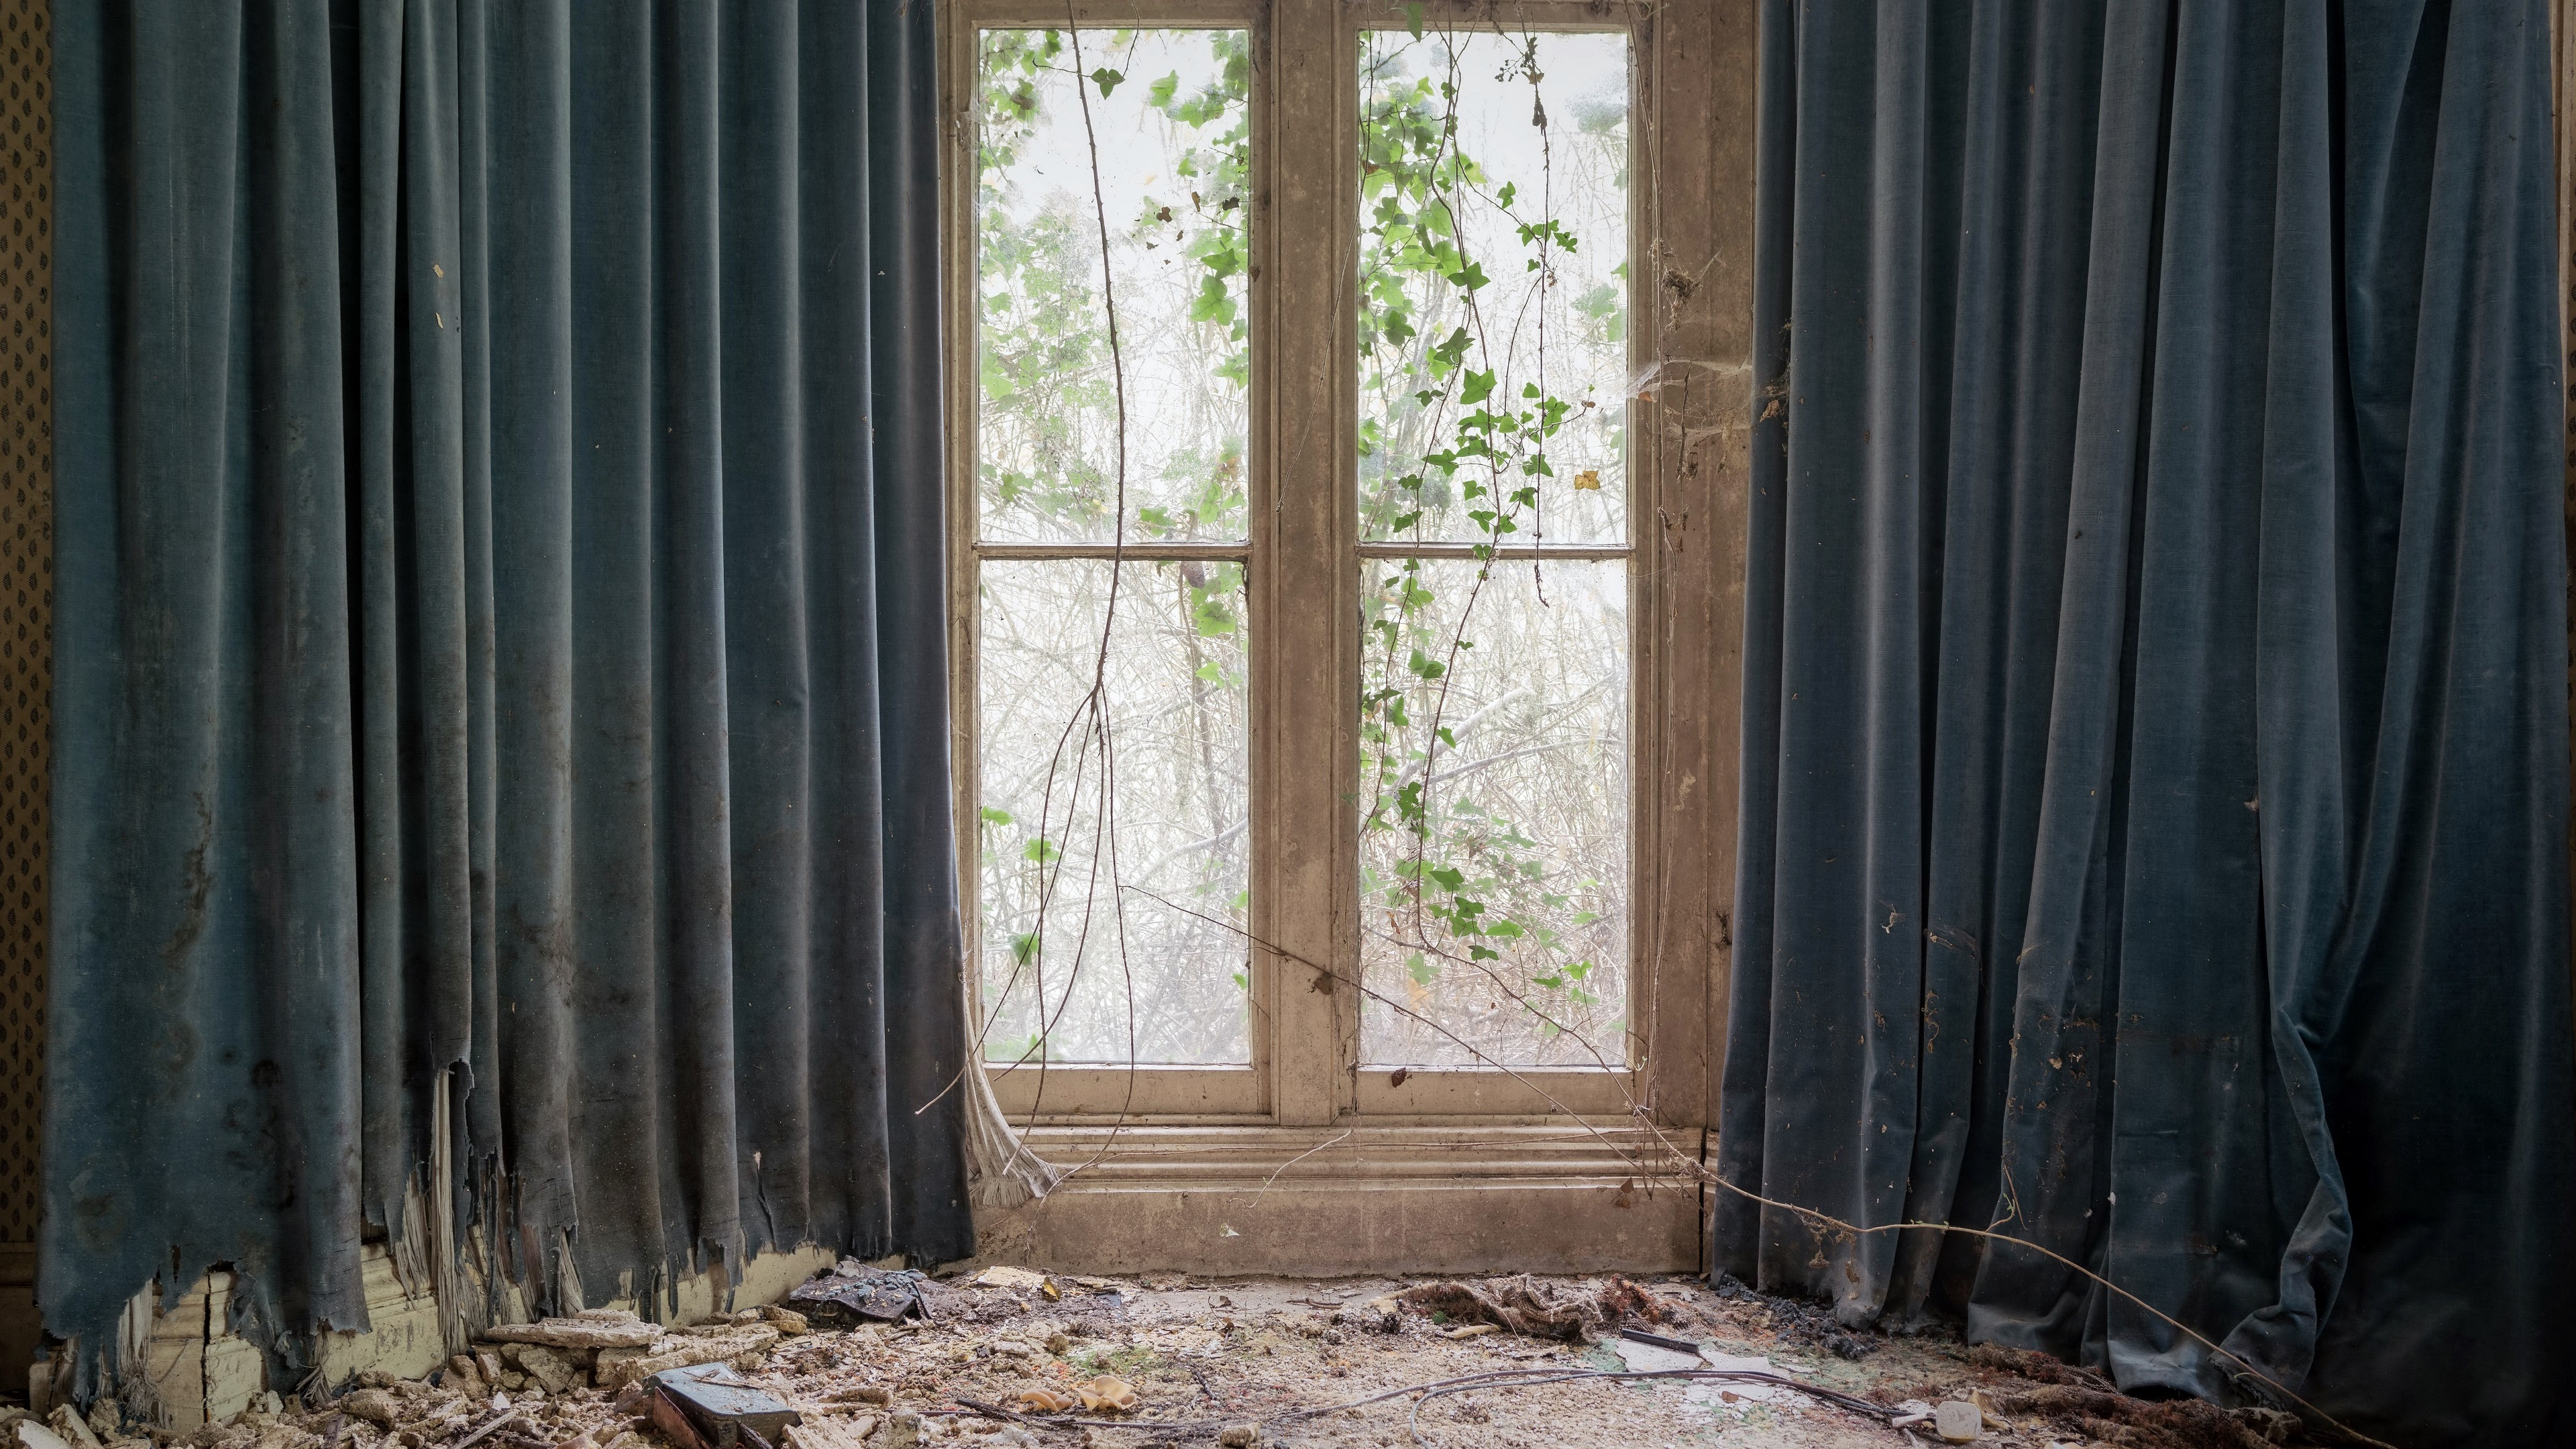 wallpaper room window curtain ruins 3840x2160 uhd 4k